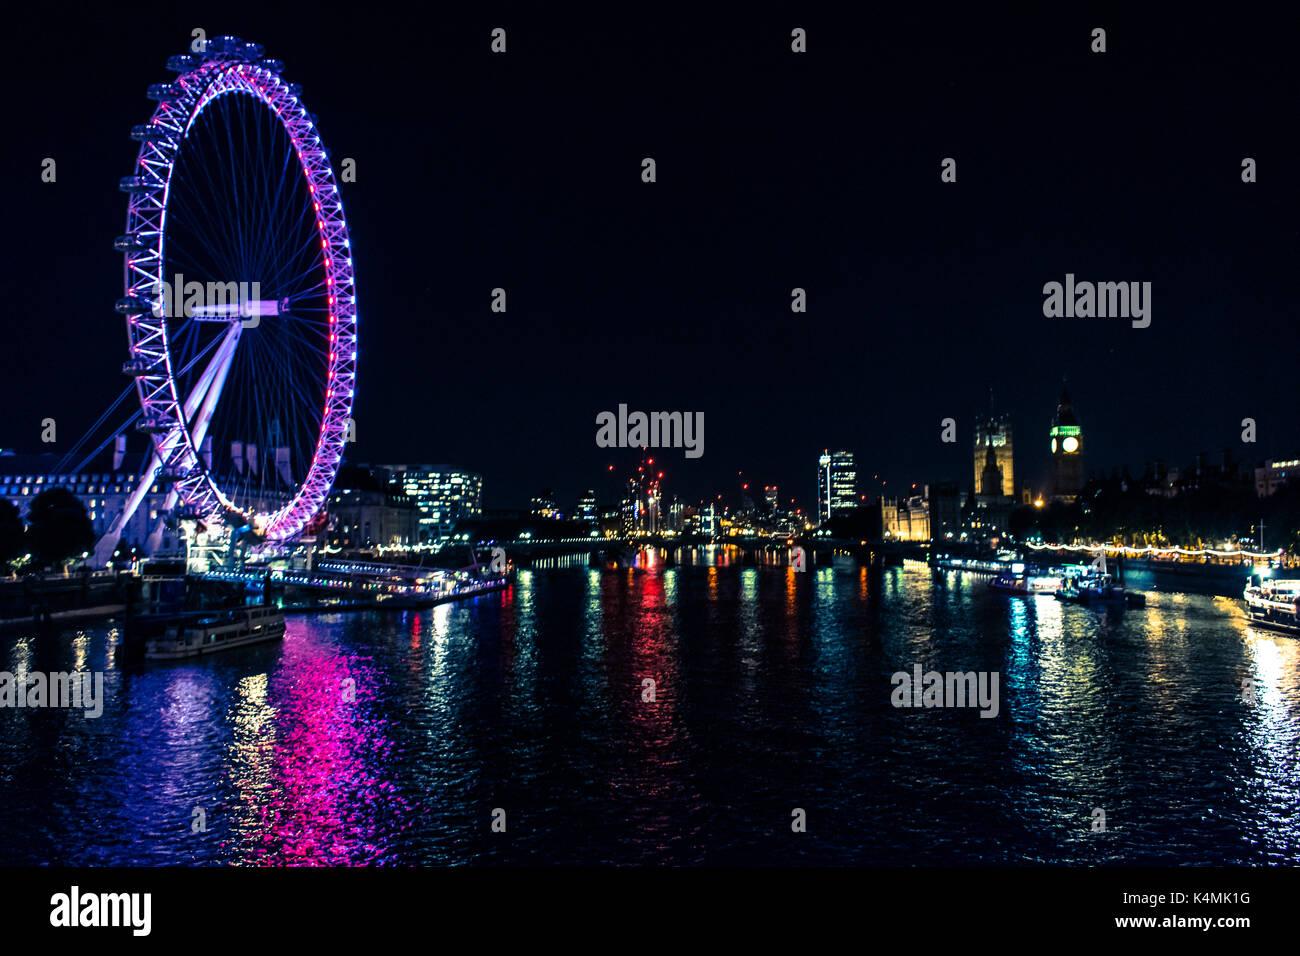 London Eye by Night - Stock Image